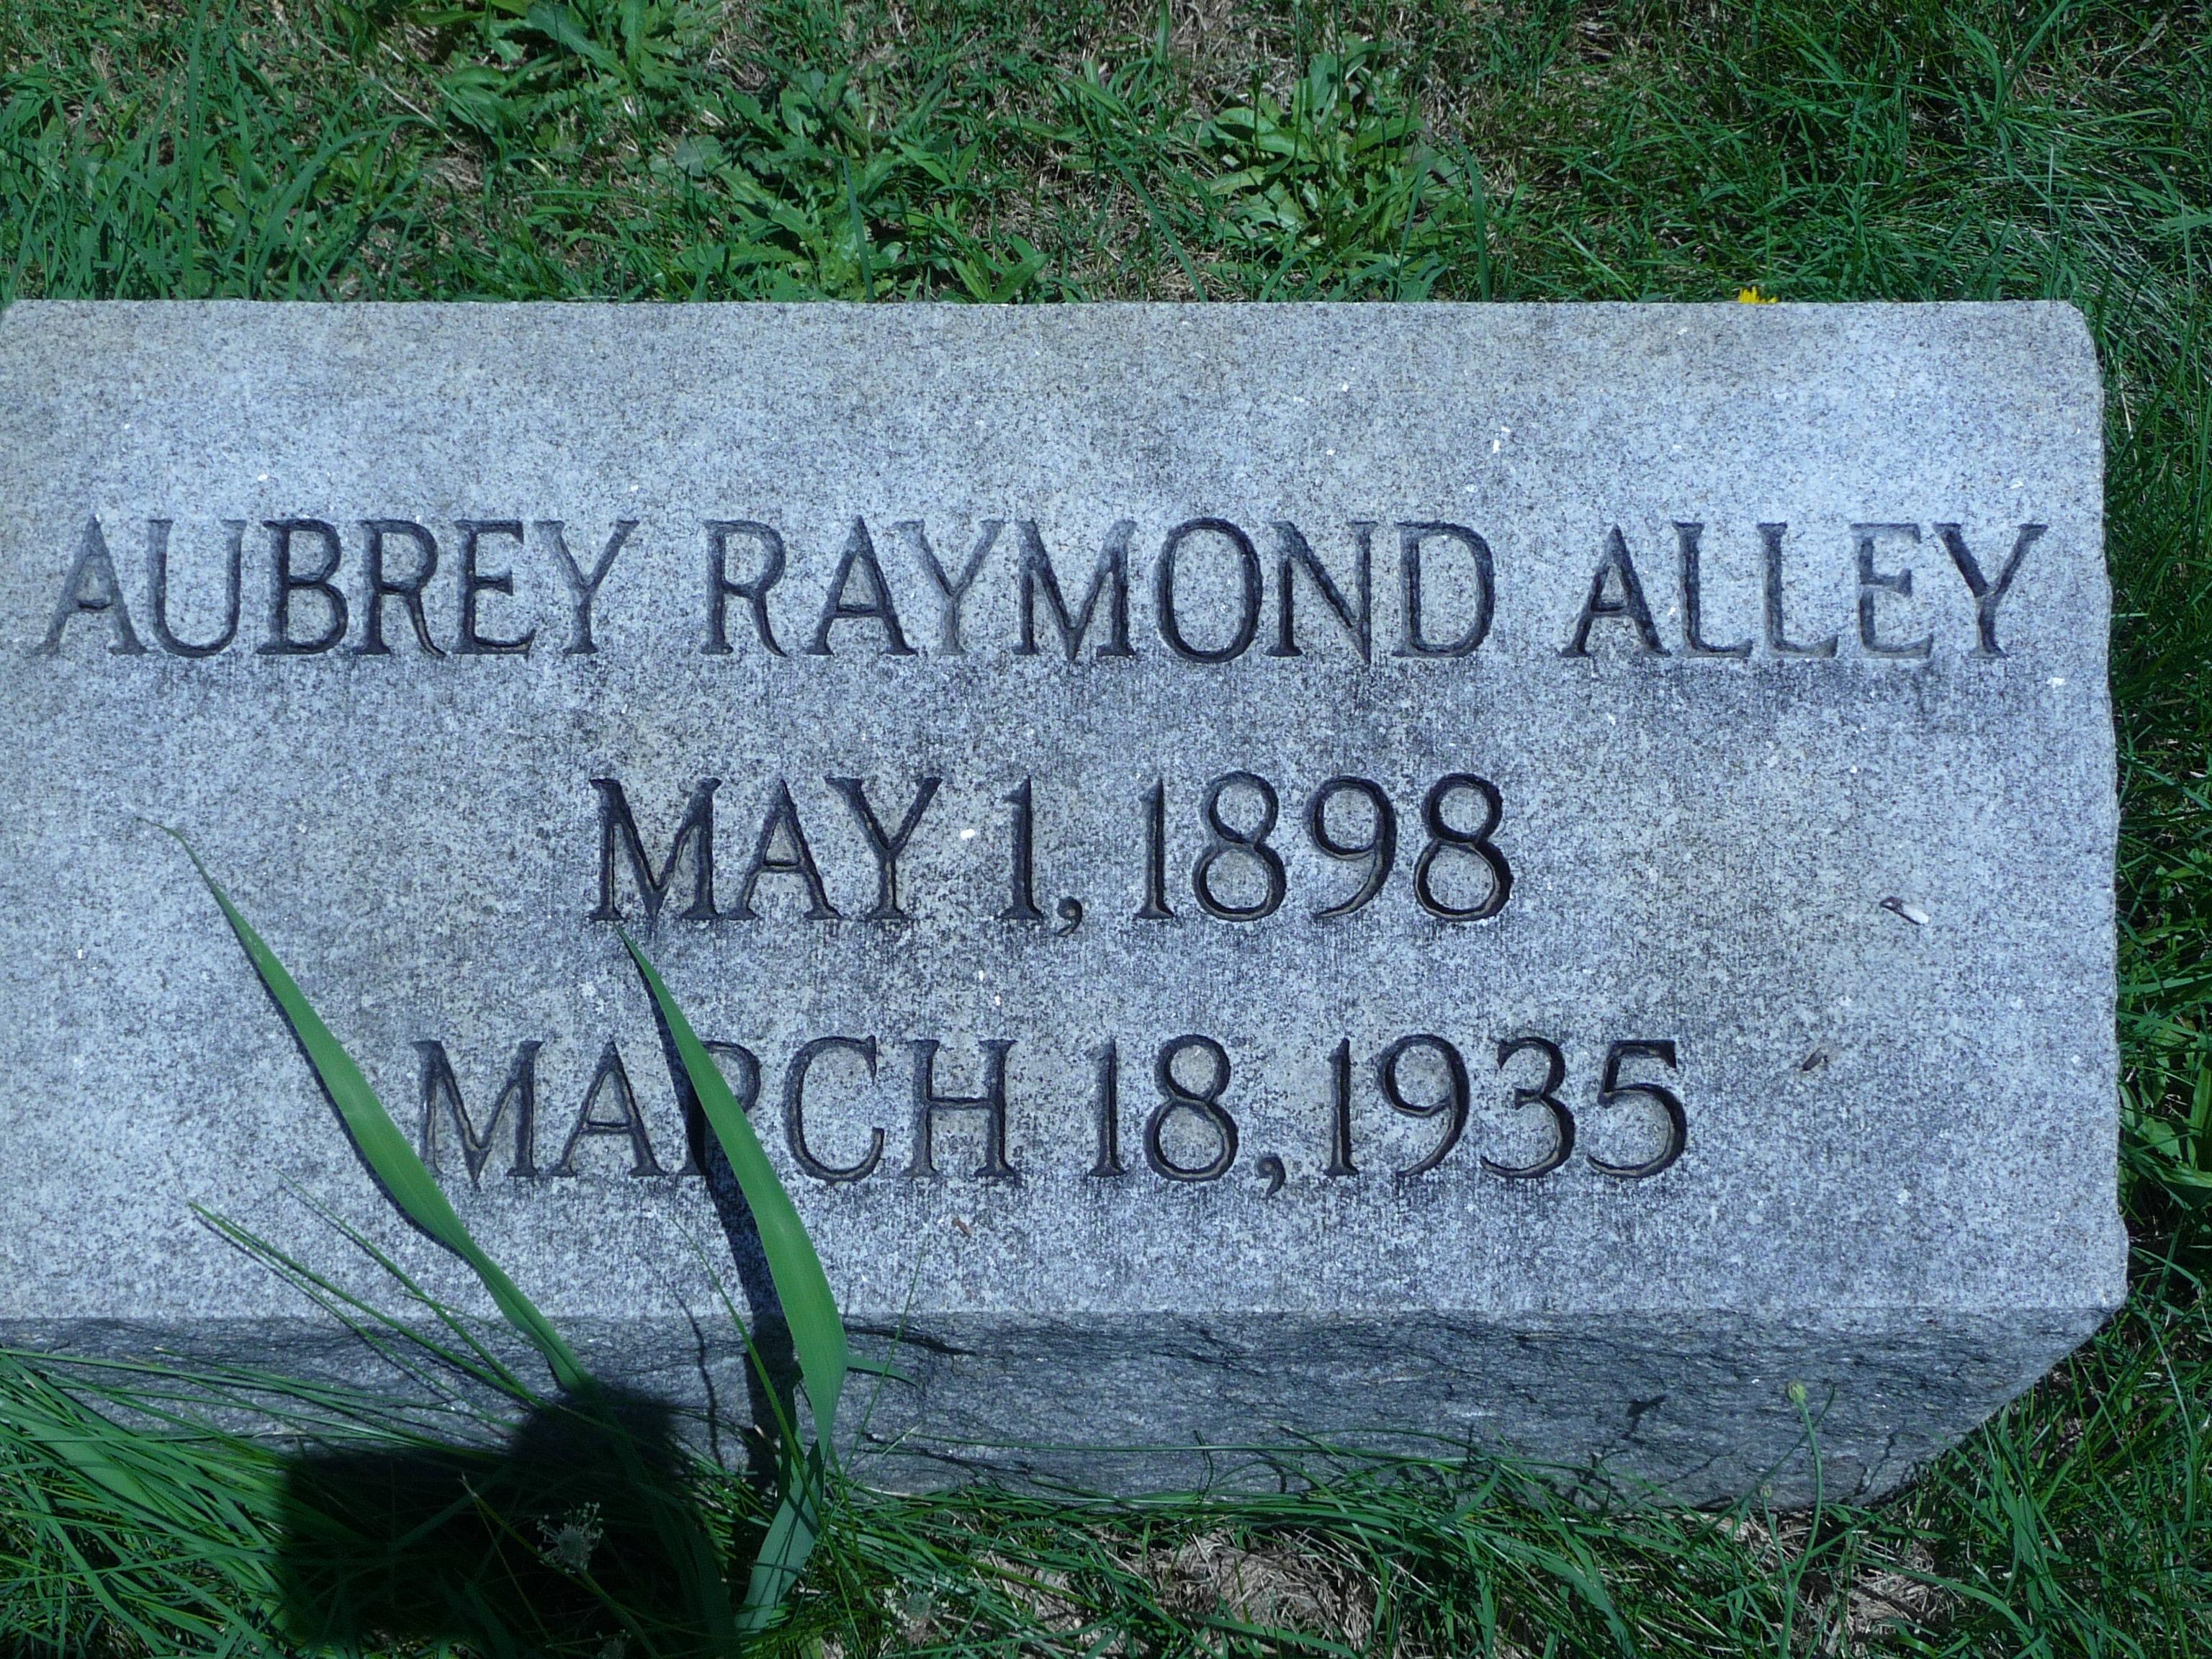 Aubrey Raymond Alley